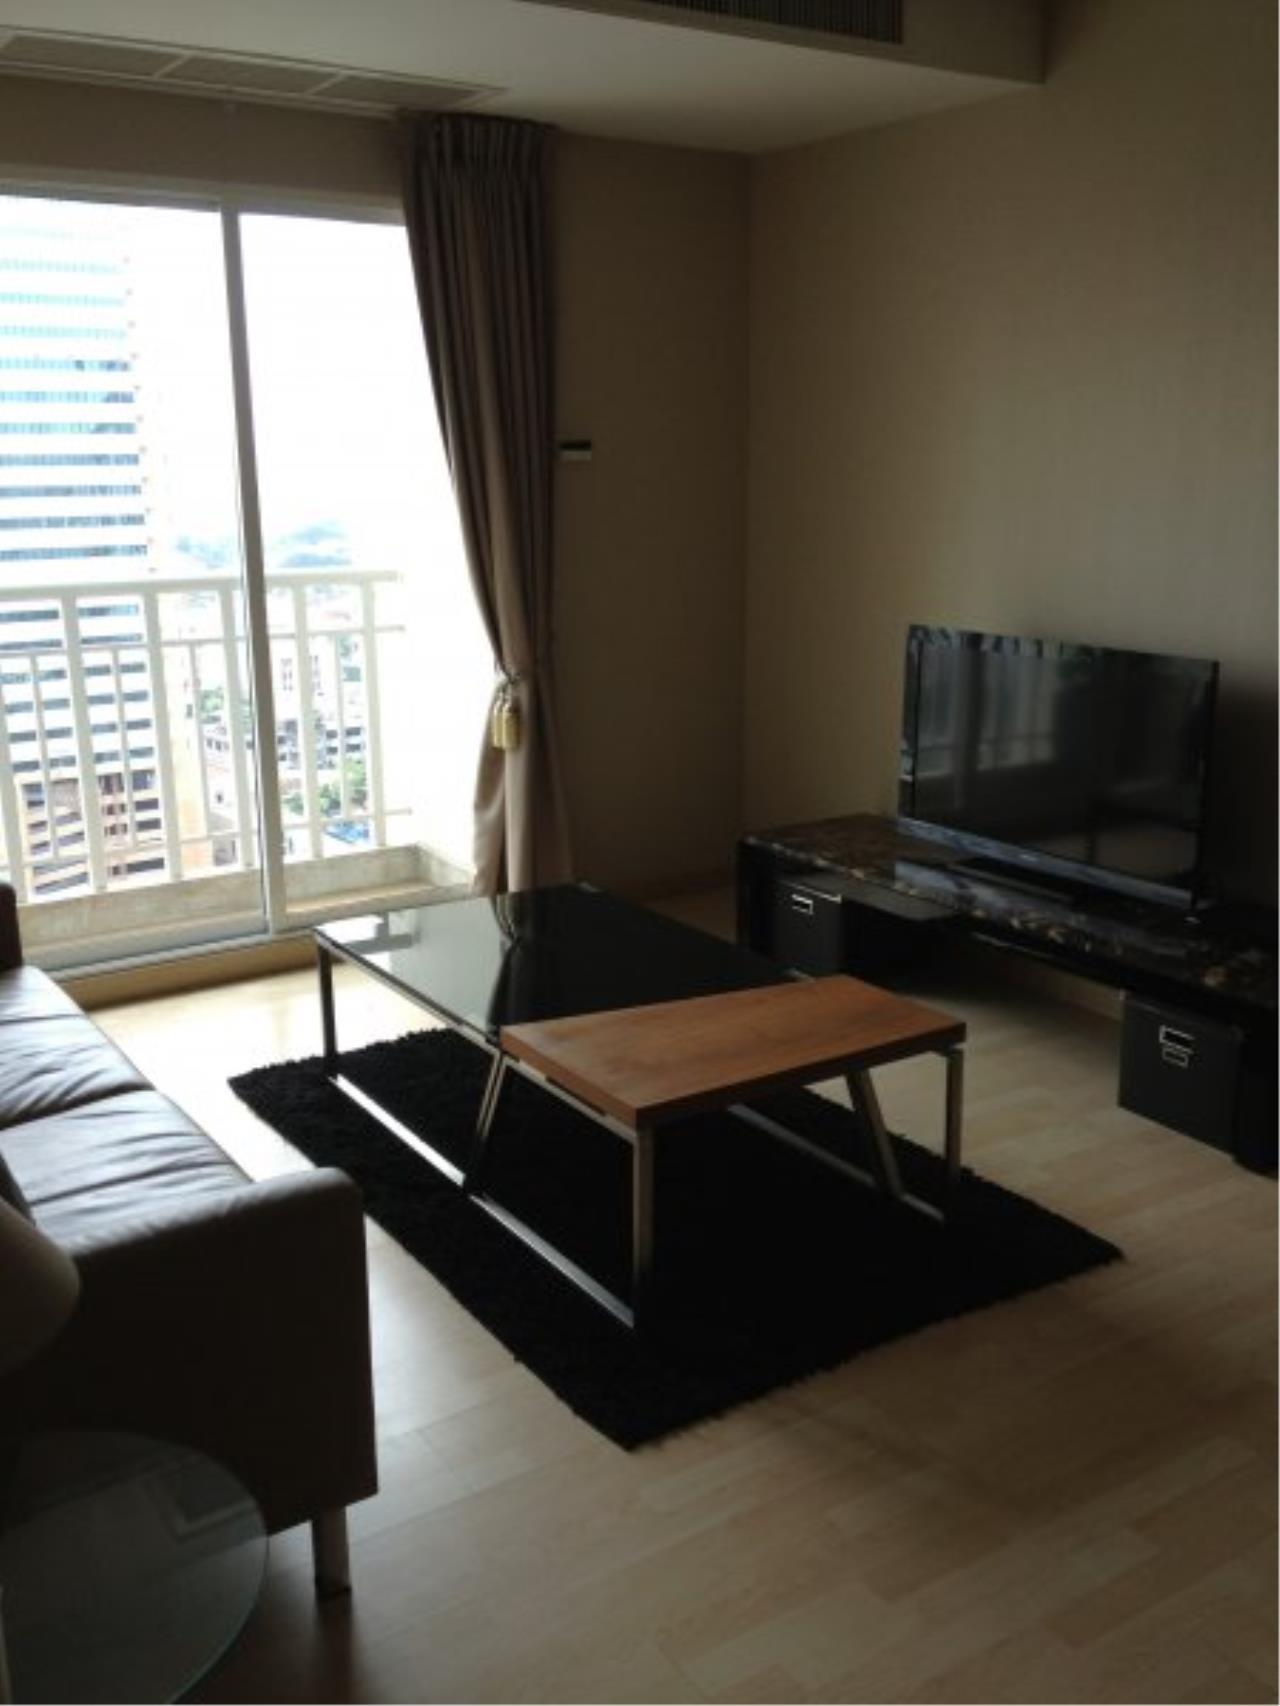 Piri Property Agency's Modern 2 Bedrooms in the 59 Heritage Bulding for rent on high floor 2